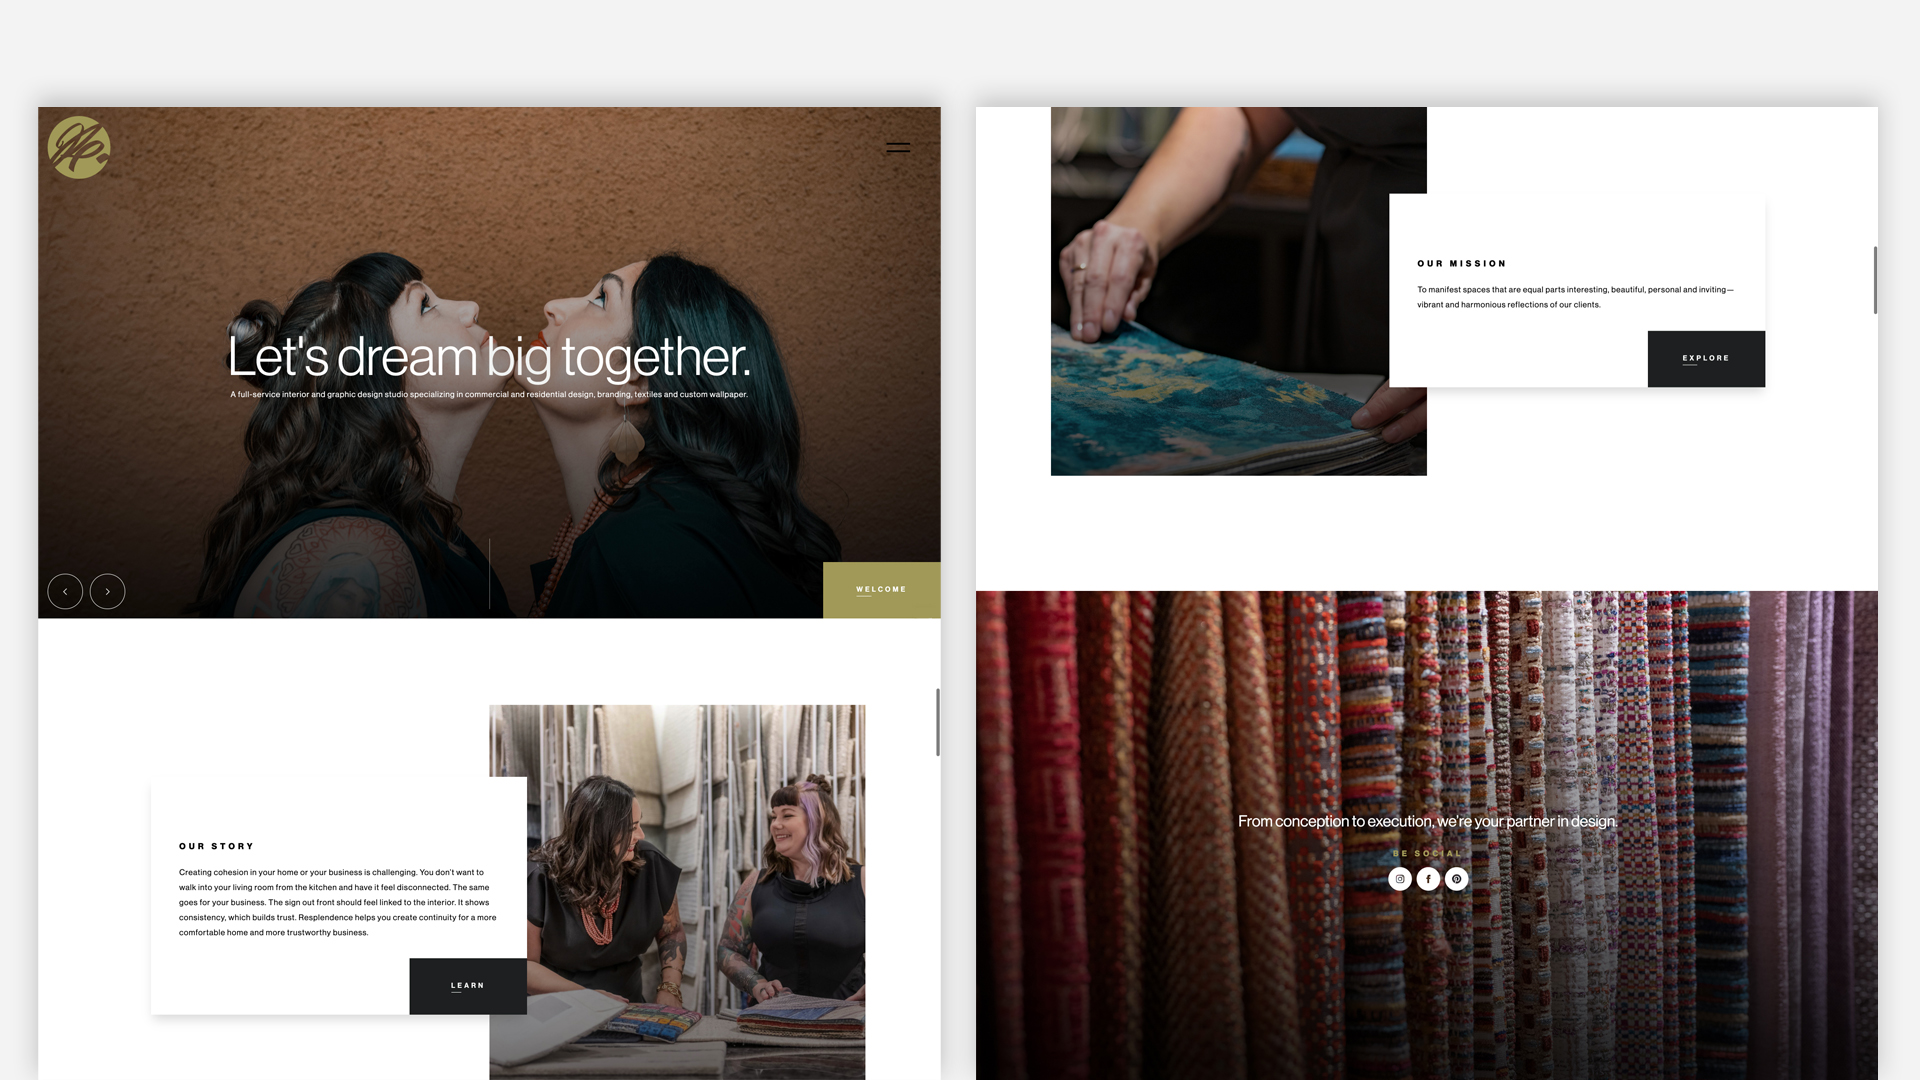 Resplendence website layout